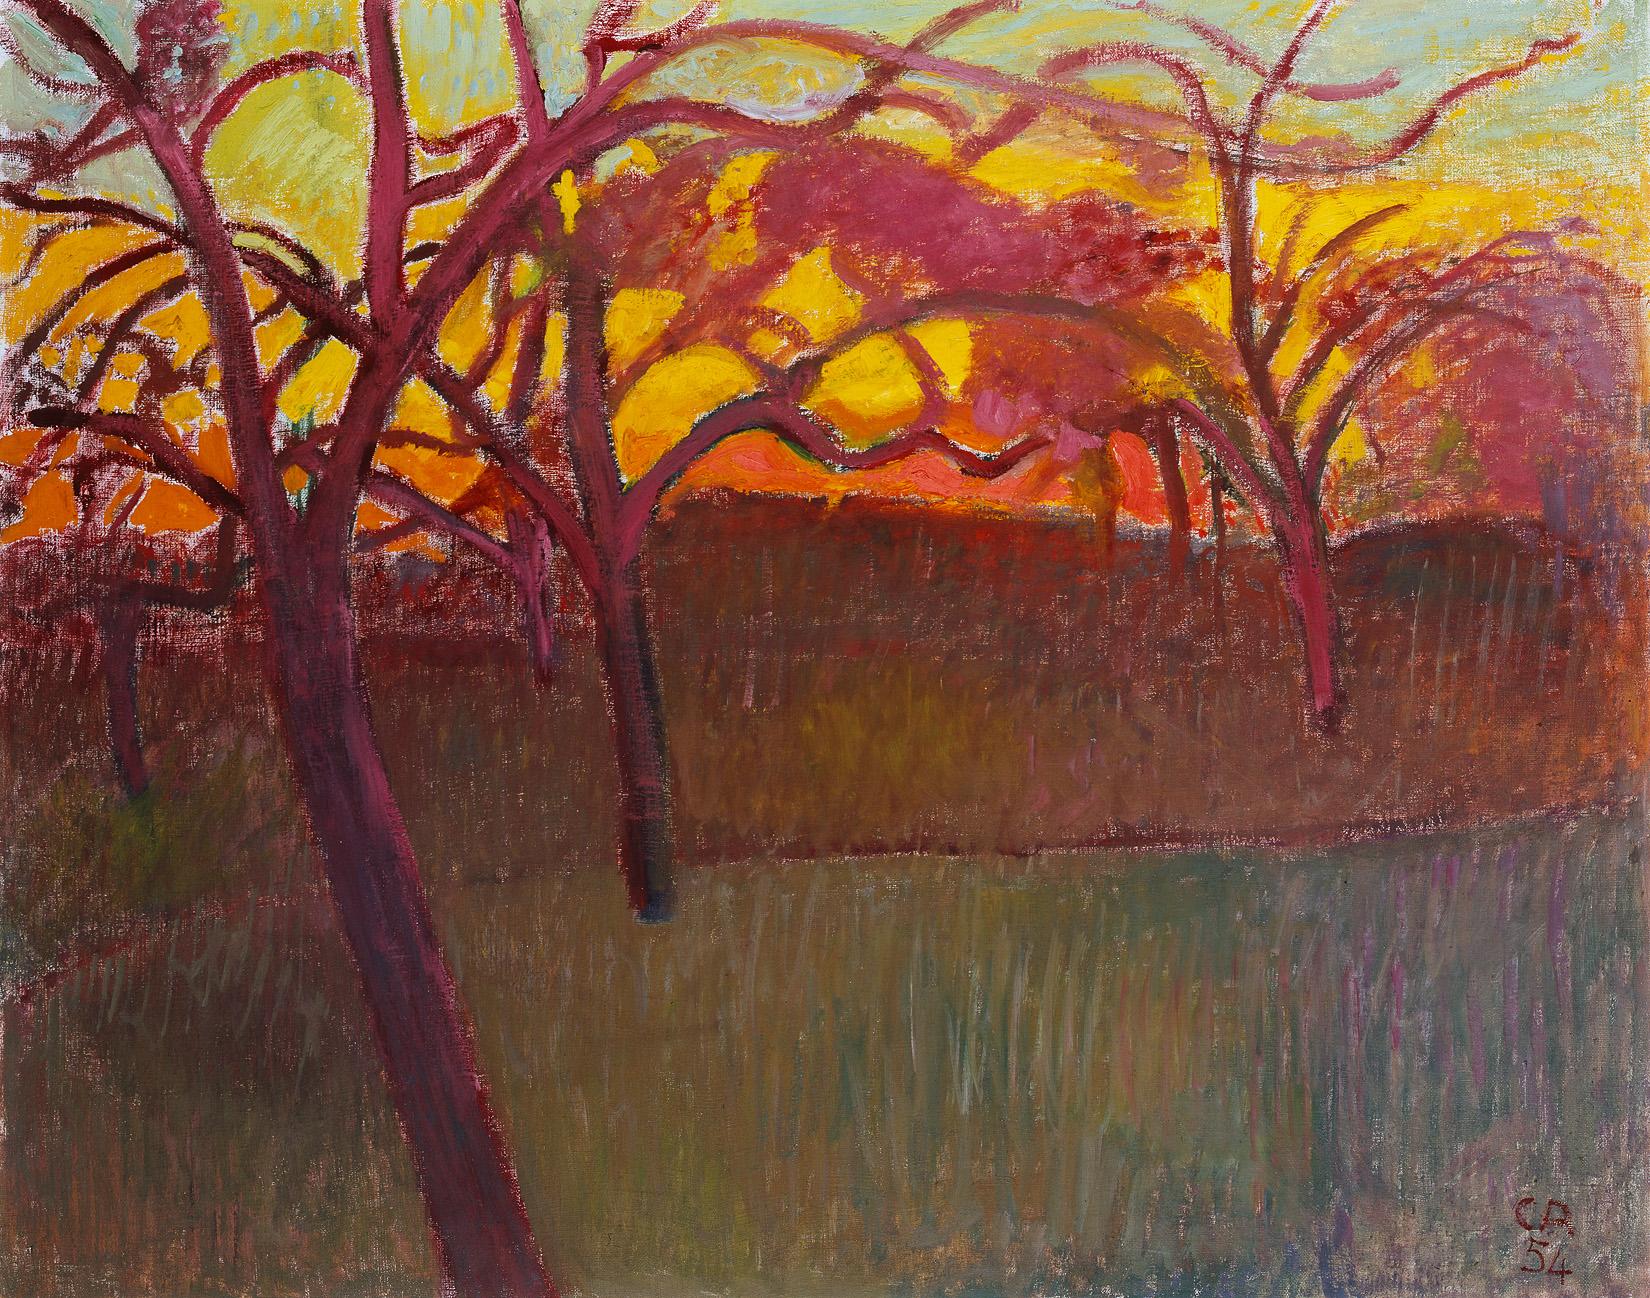 Cuno Amiet, Sonnenuntergang, 1954